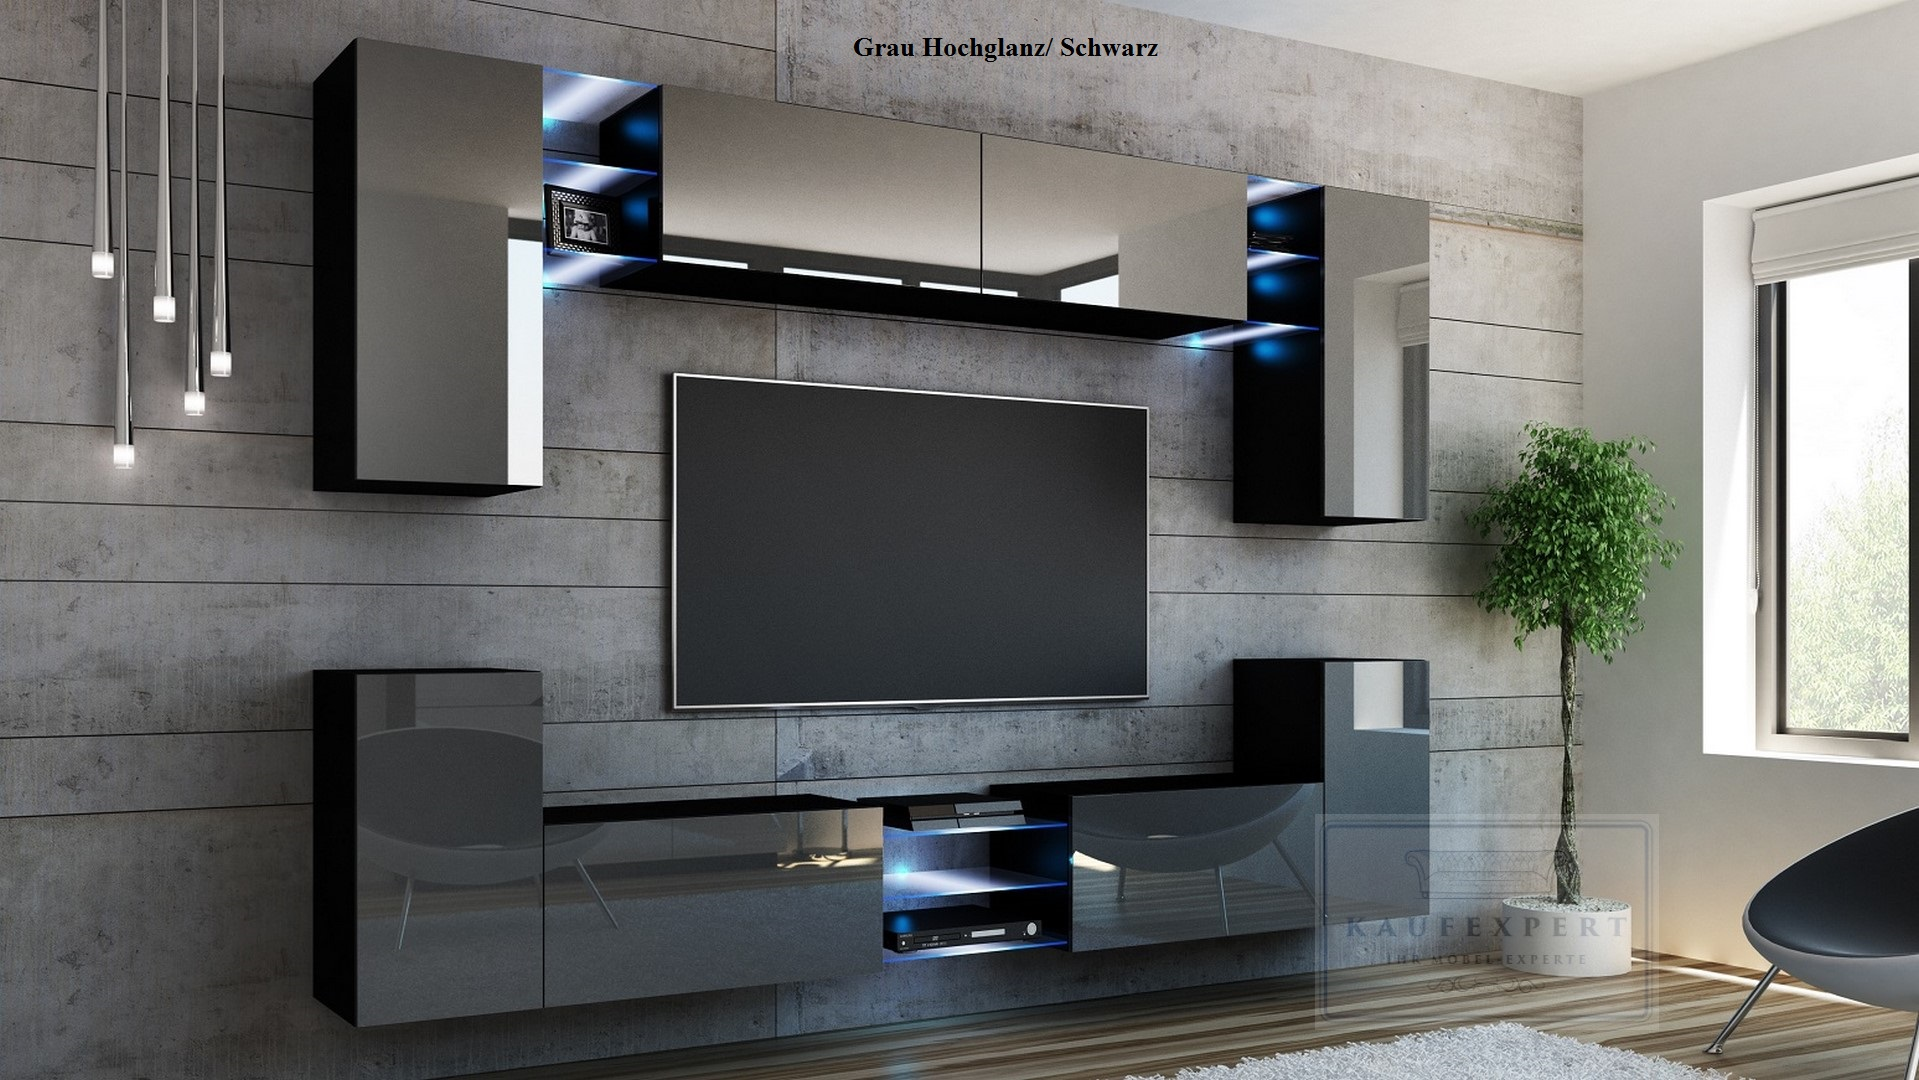 wohnwand galaxy wei schwarz hochglanz anbauwand wohnwand led beleuchtung modern ebay. Black Bedroom Furniture Sets. Home Design Ideas